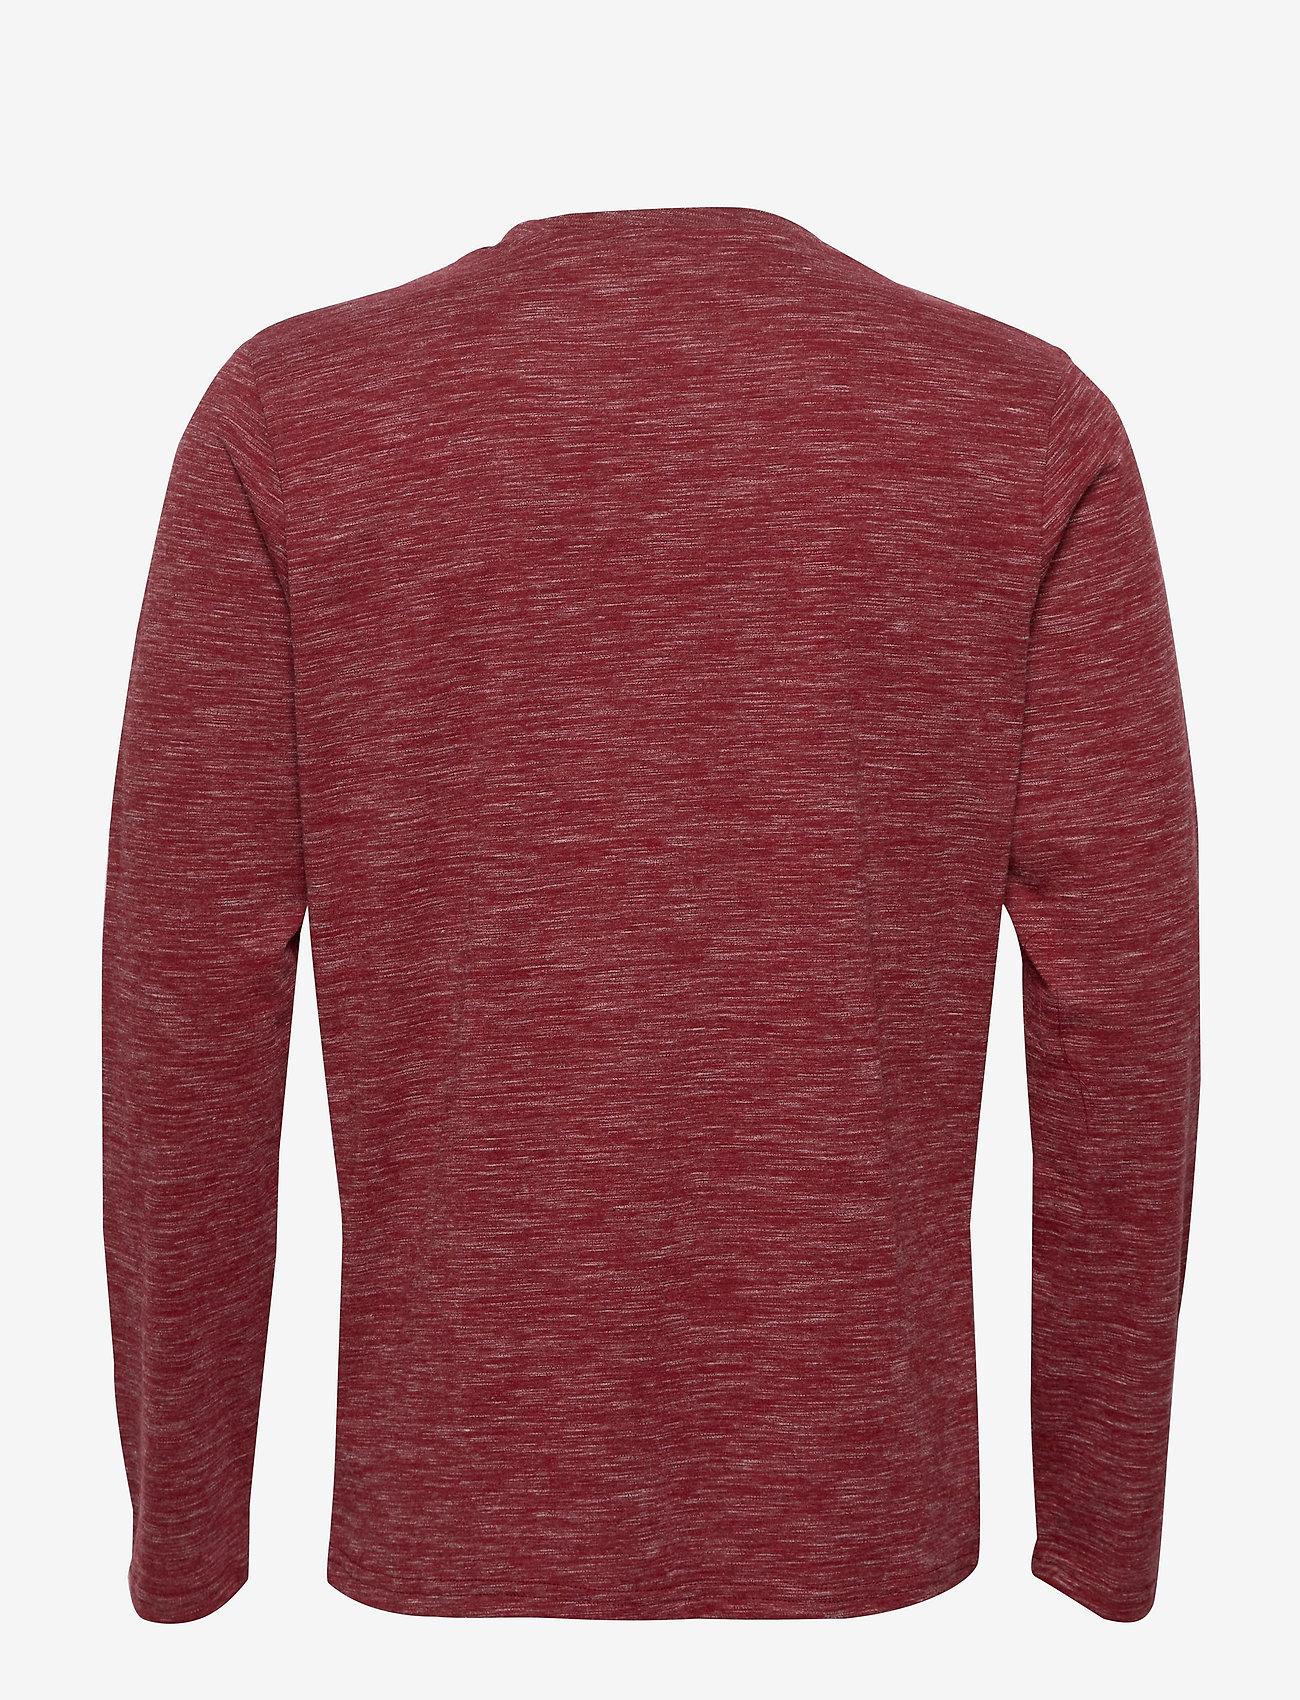 Superdry Vl Premium Goods Ls - T-shirts